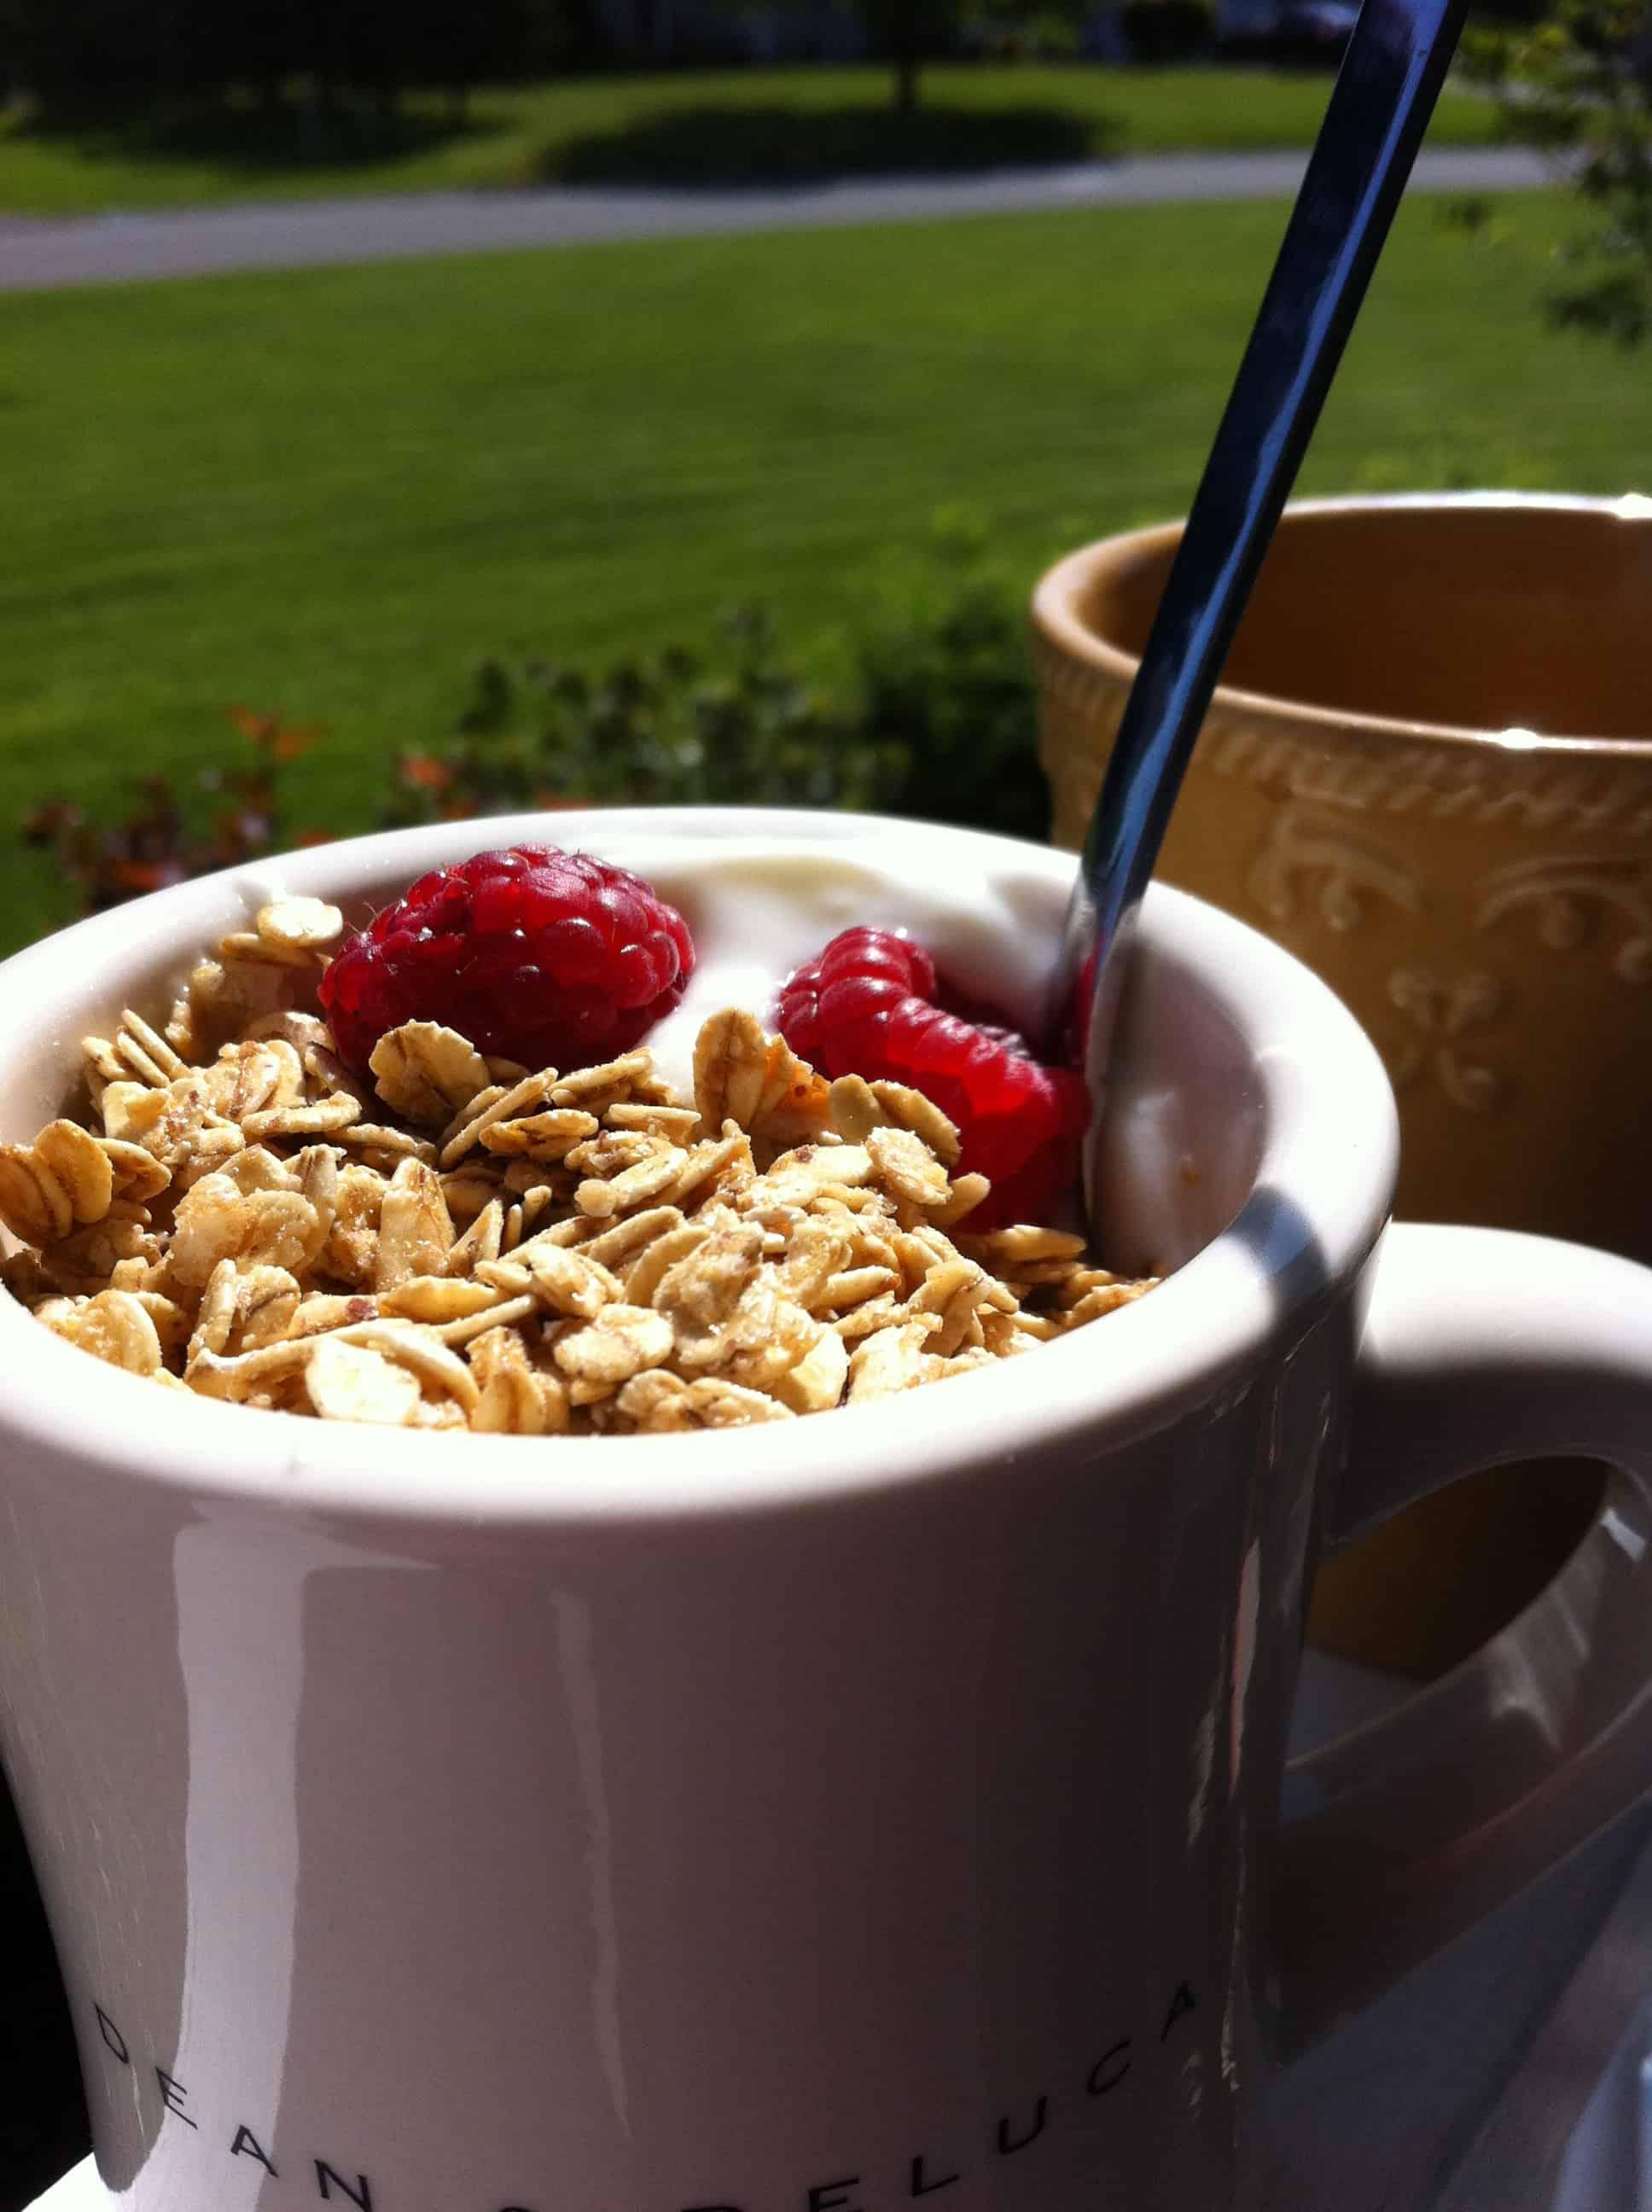 eatpicks-granola-momgotblog